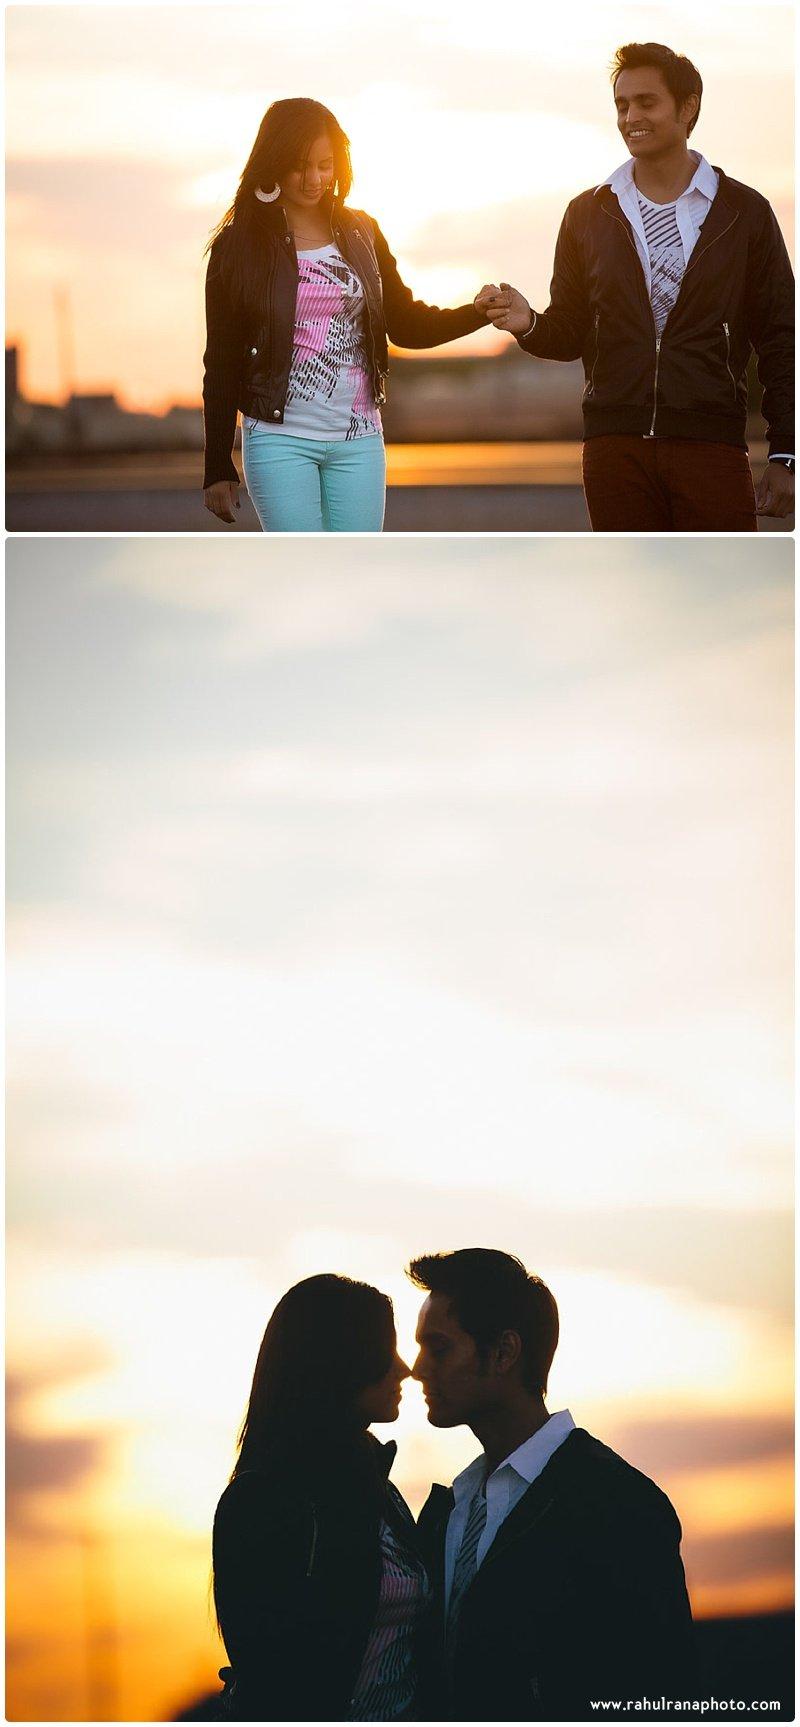 Rina Sunny - train tracks sunset holding hands engagement - Rahul Rana Photography